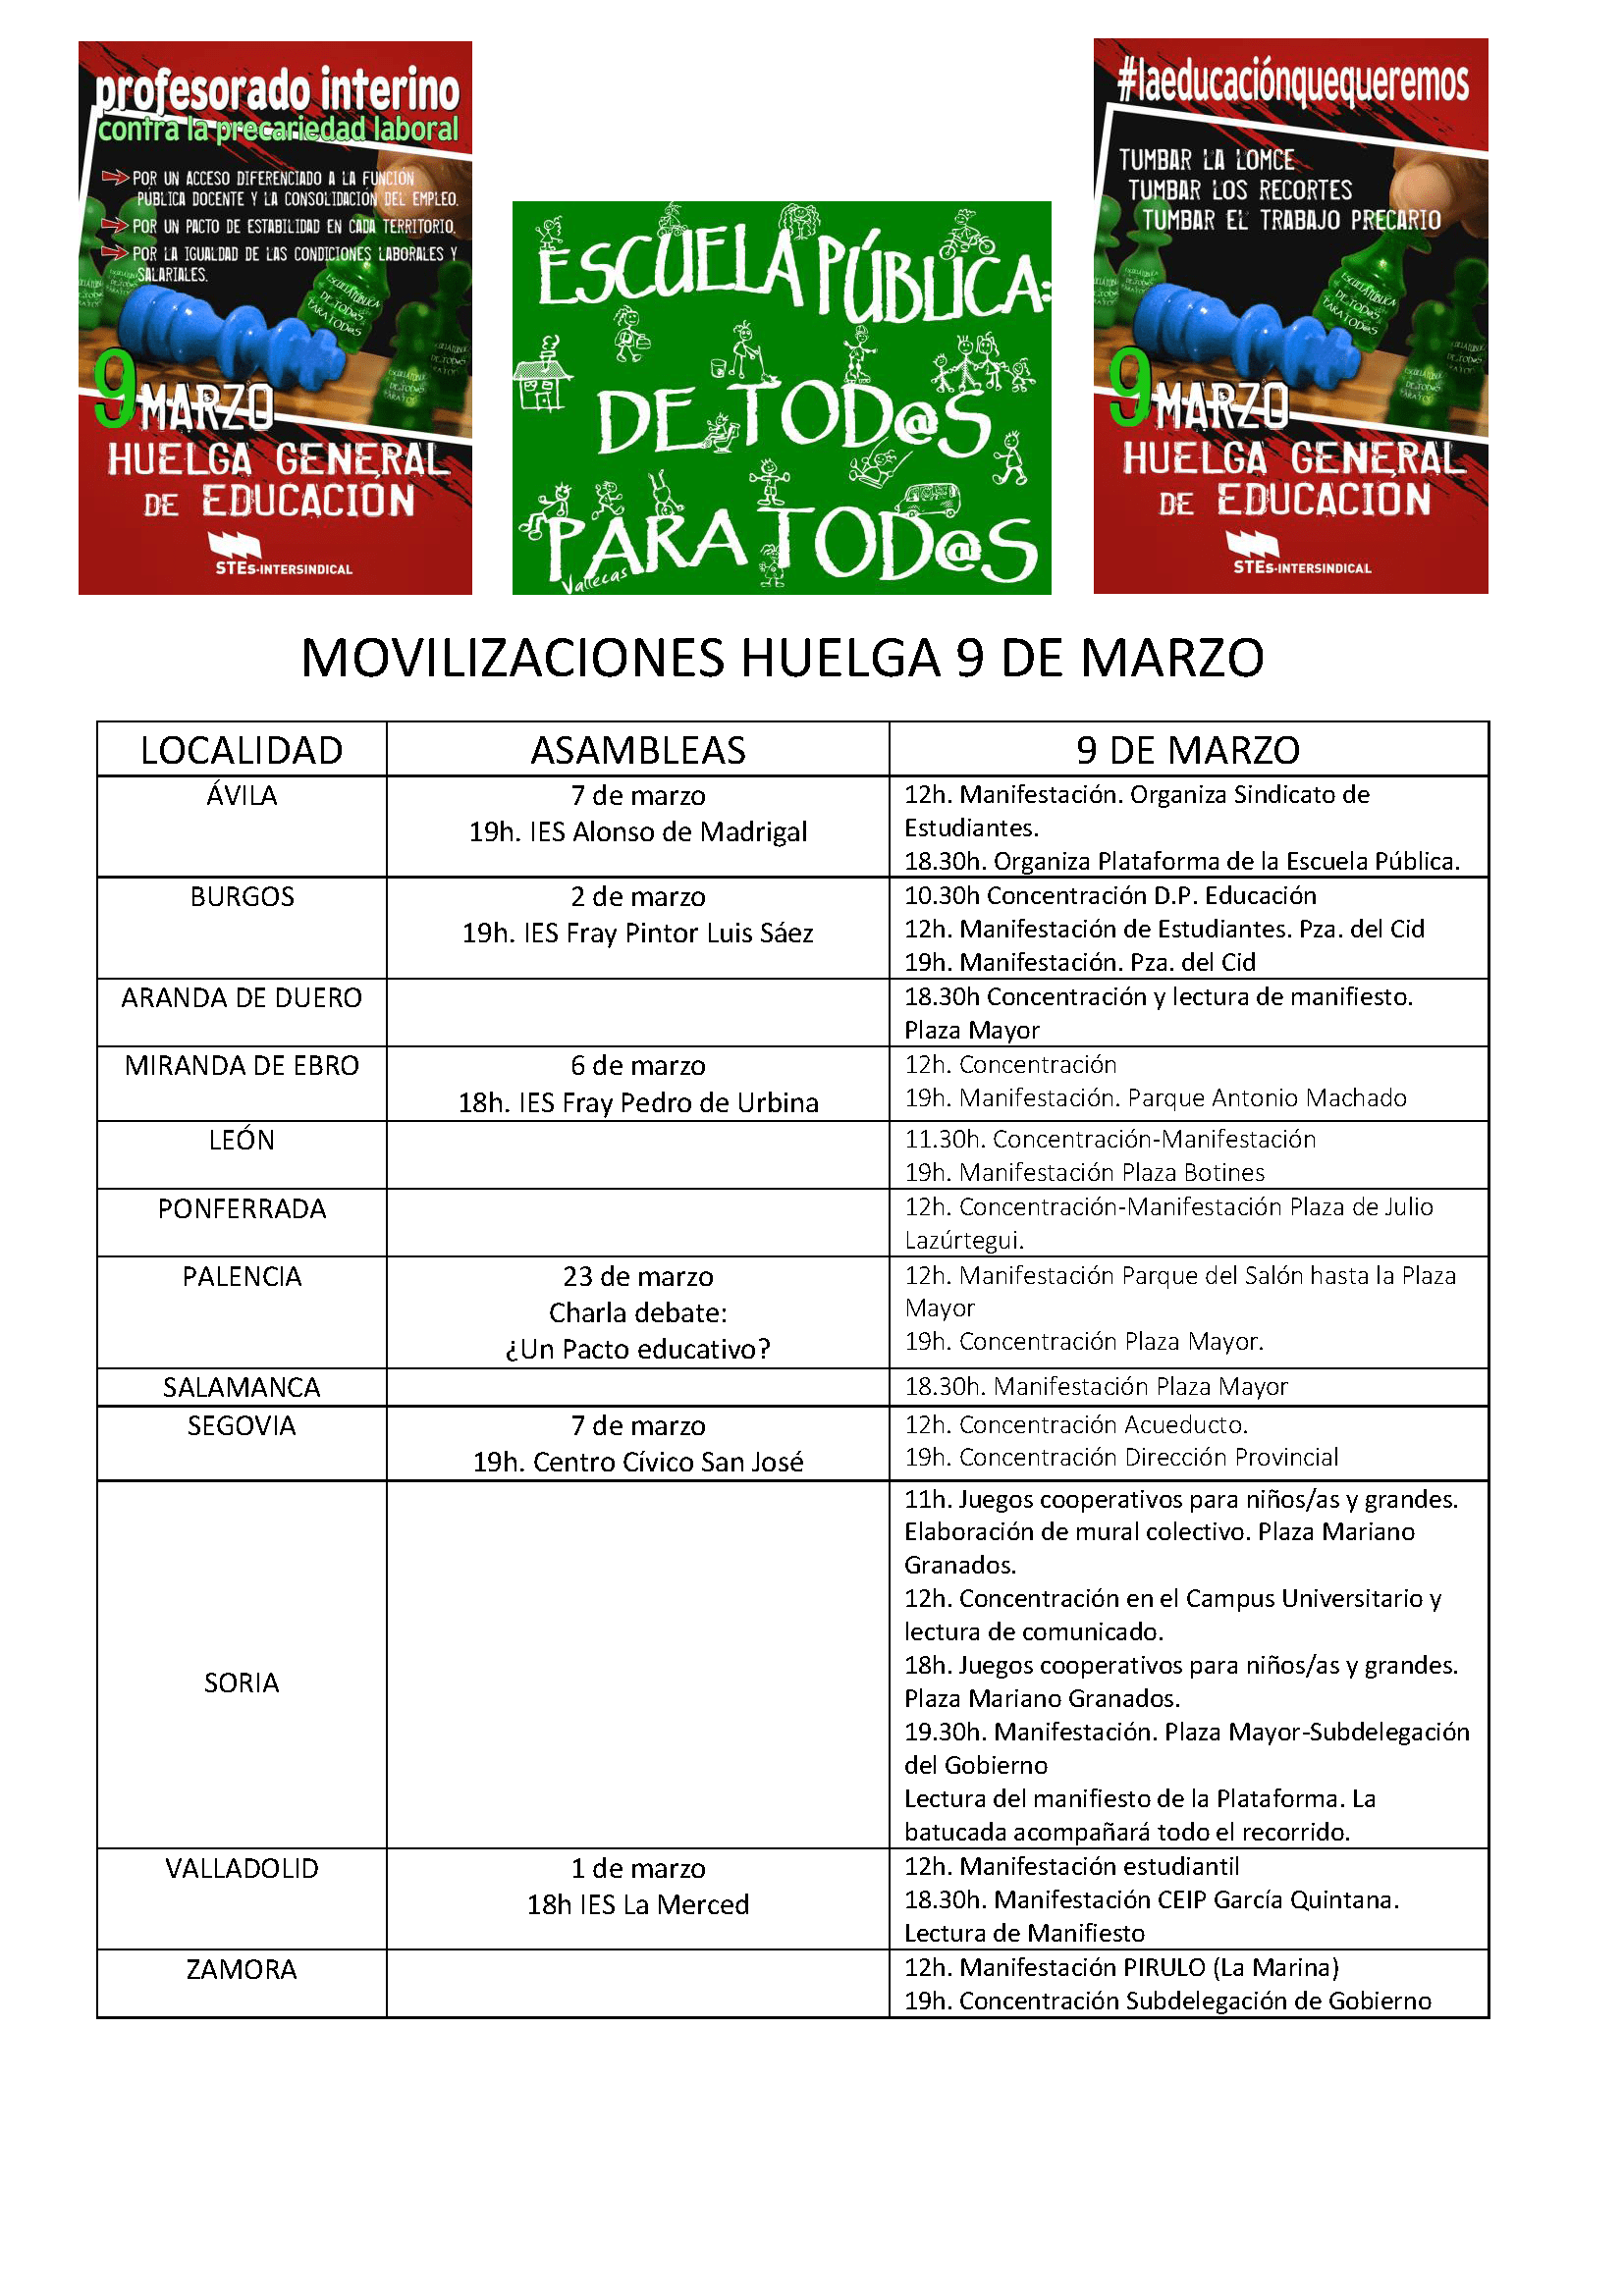 9M2017-Movilizaciones